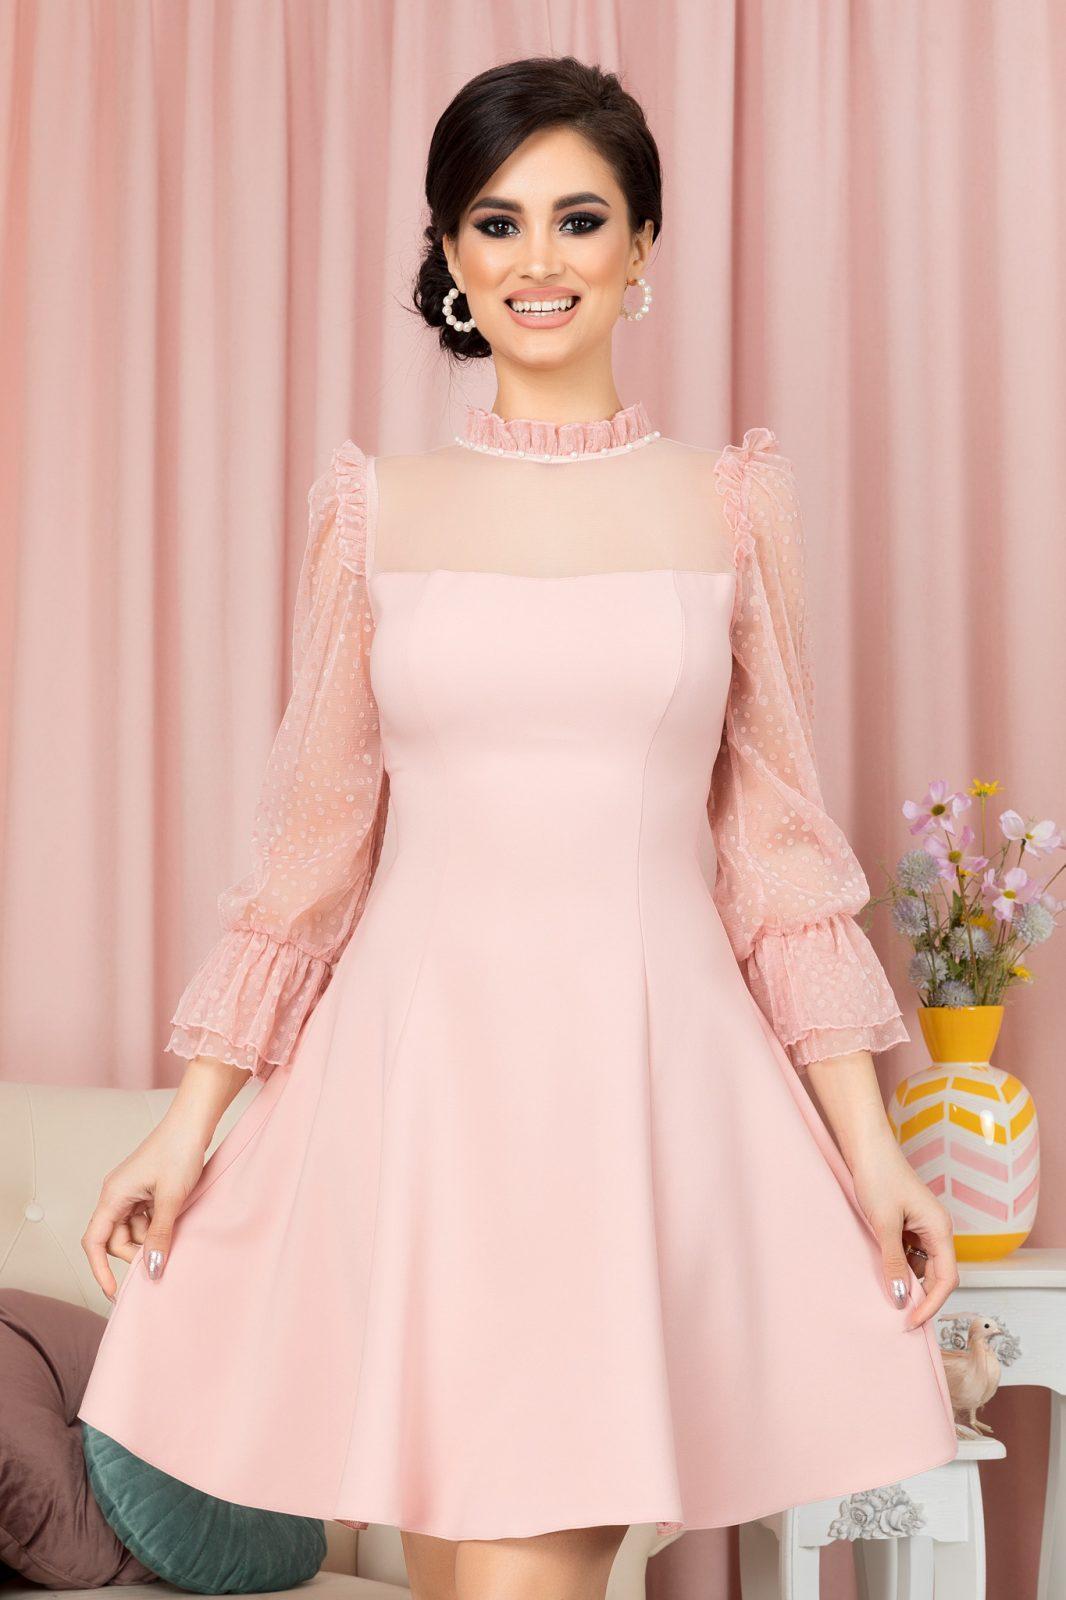 Loving Pink Dress